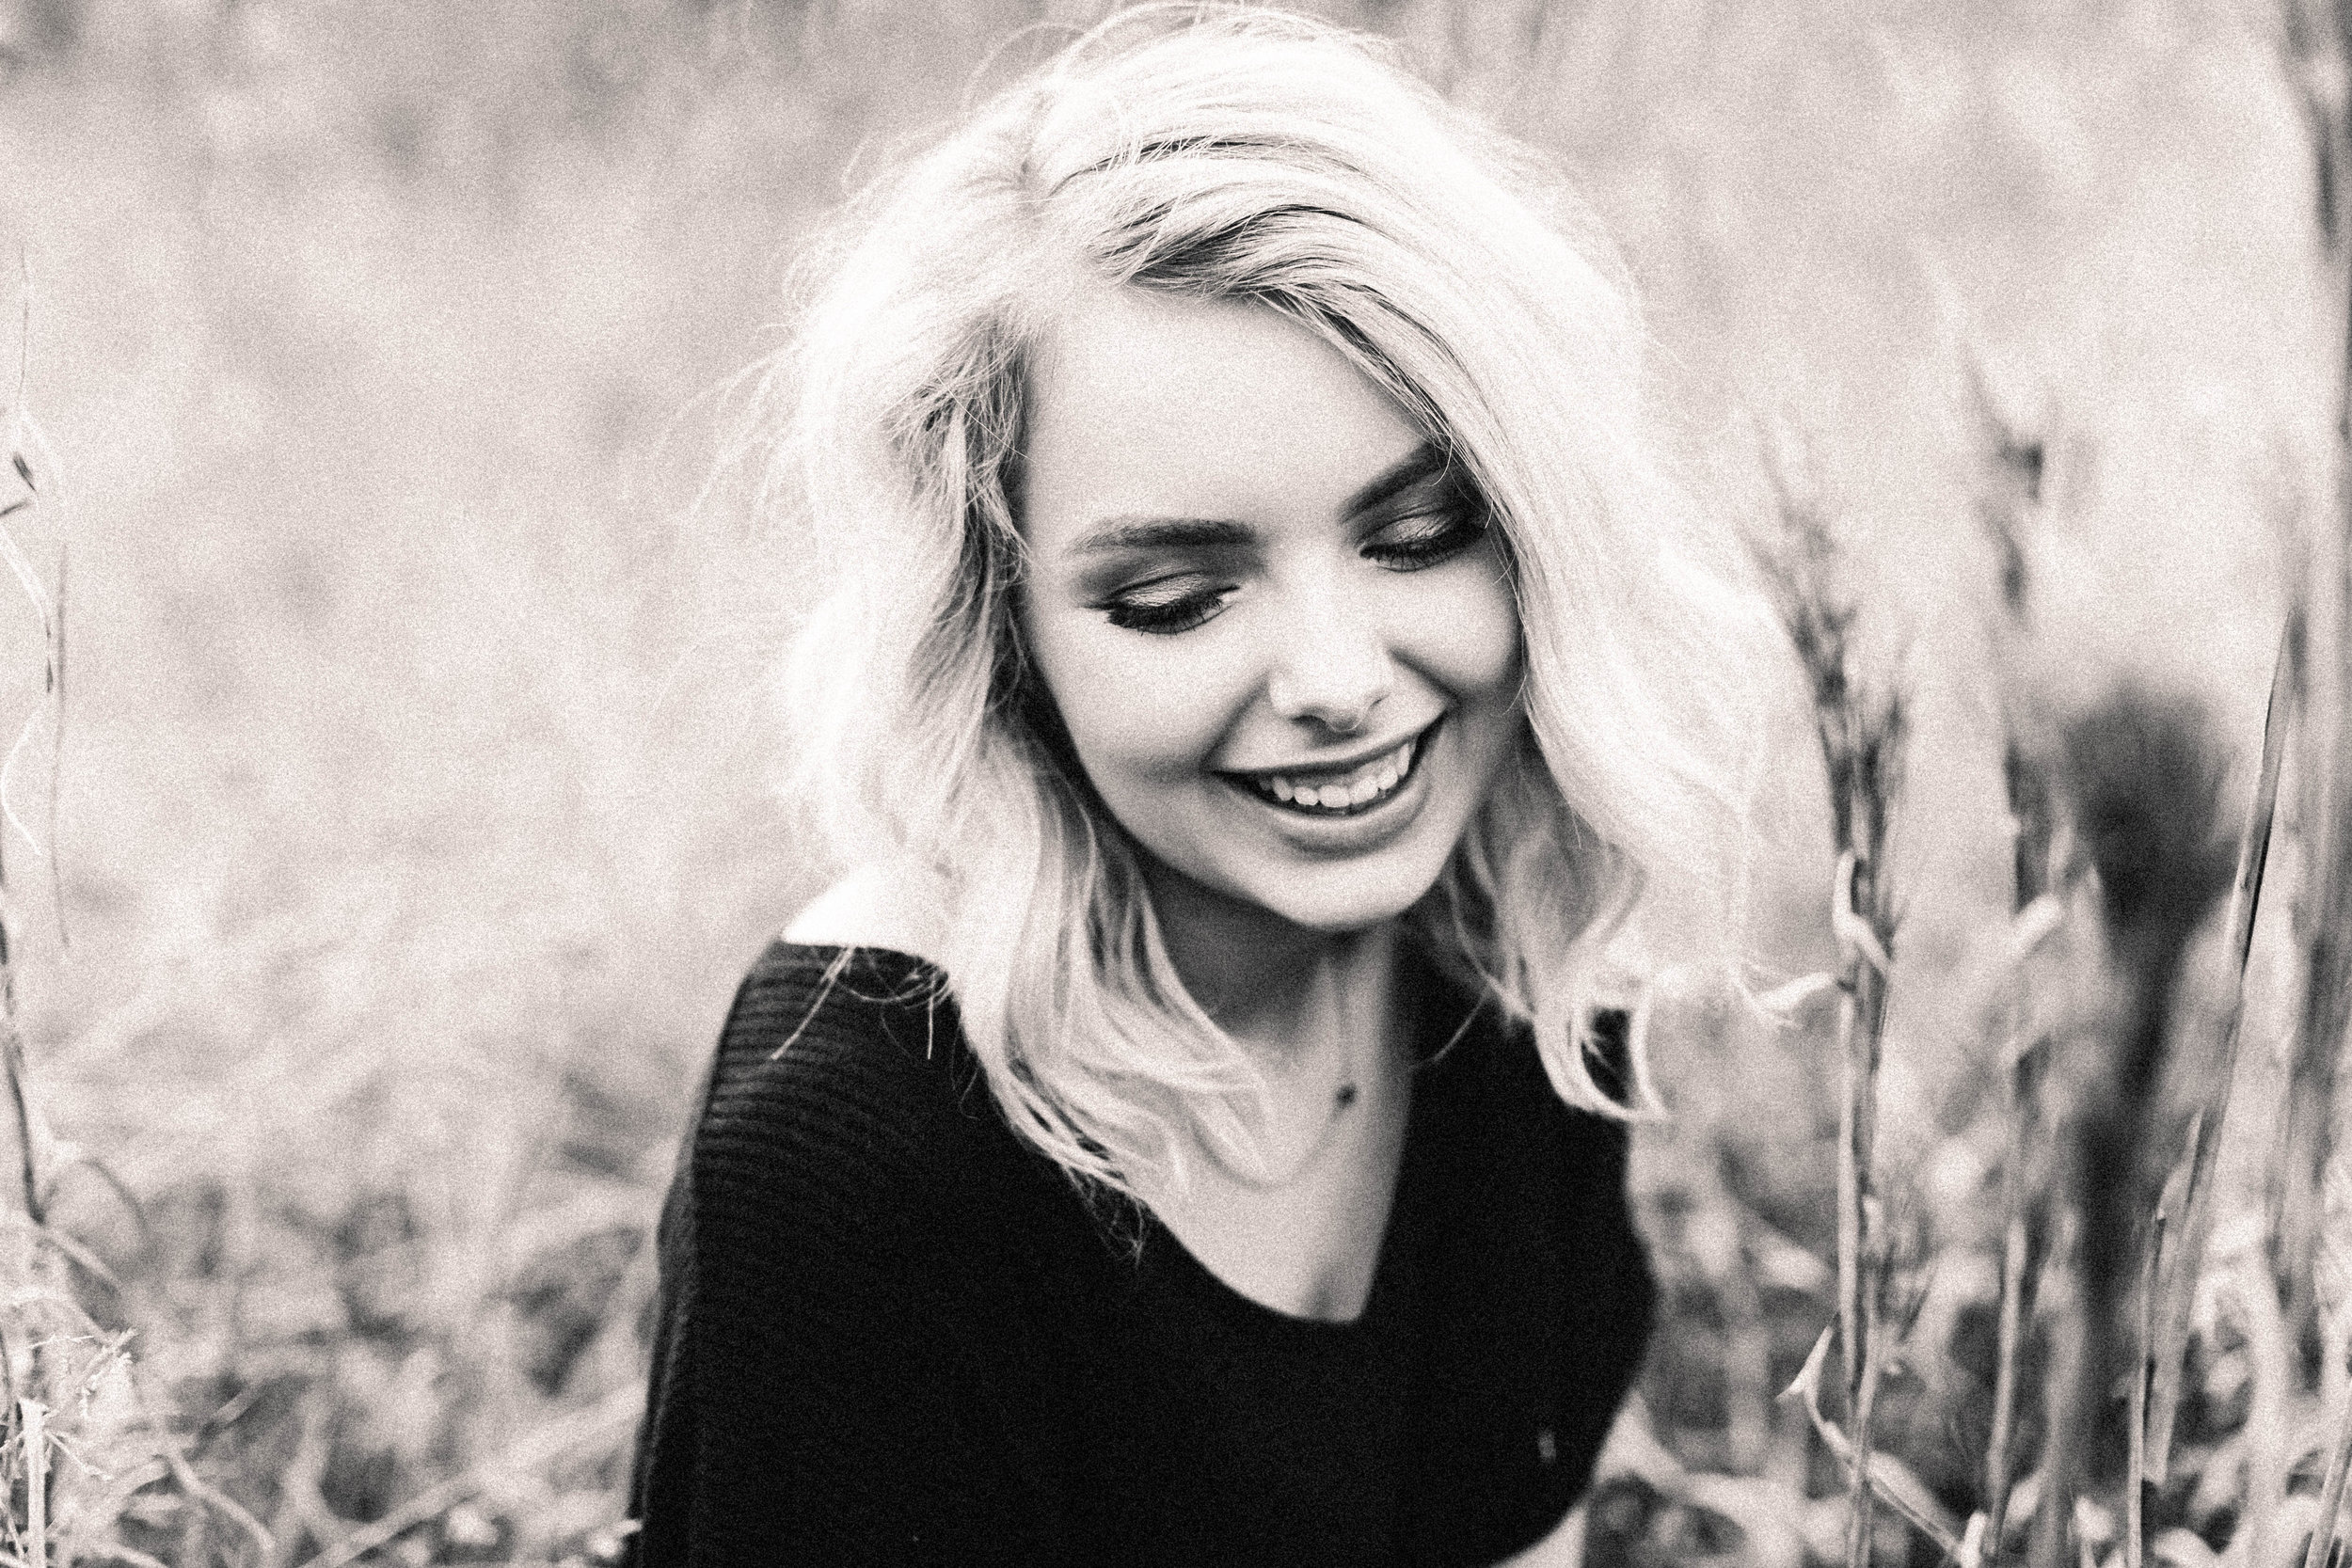 orlando senior portrait photographer